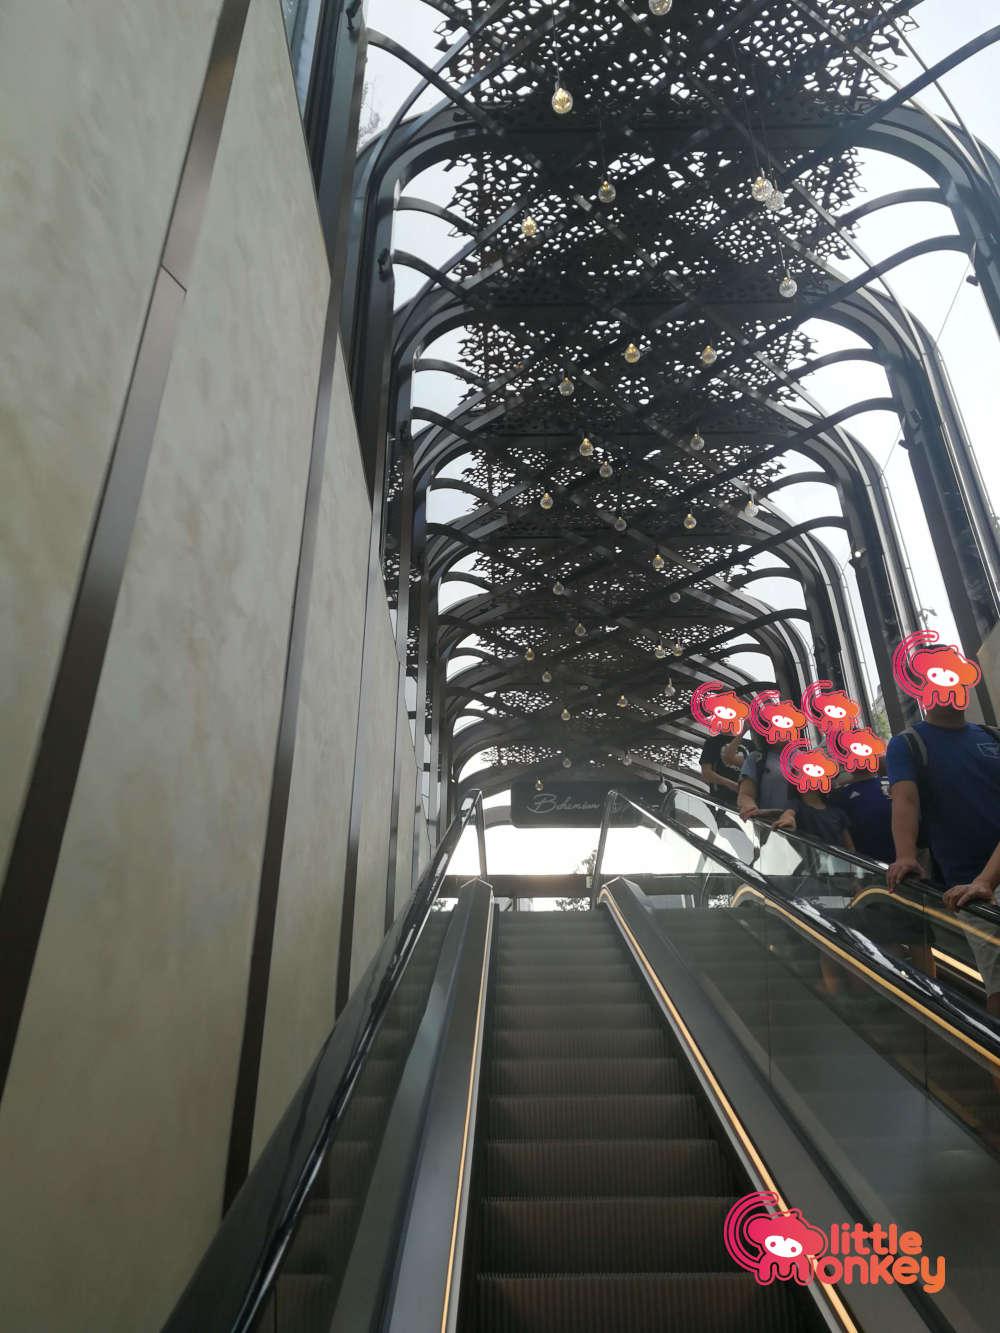 K11 Musea Escalator to Bohemian Garden